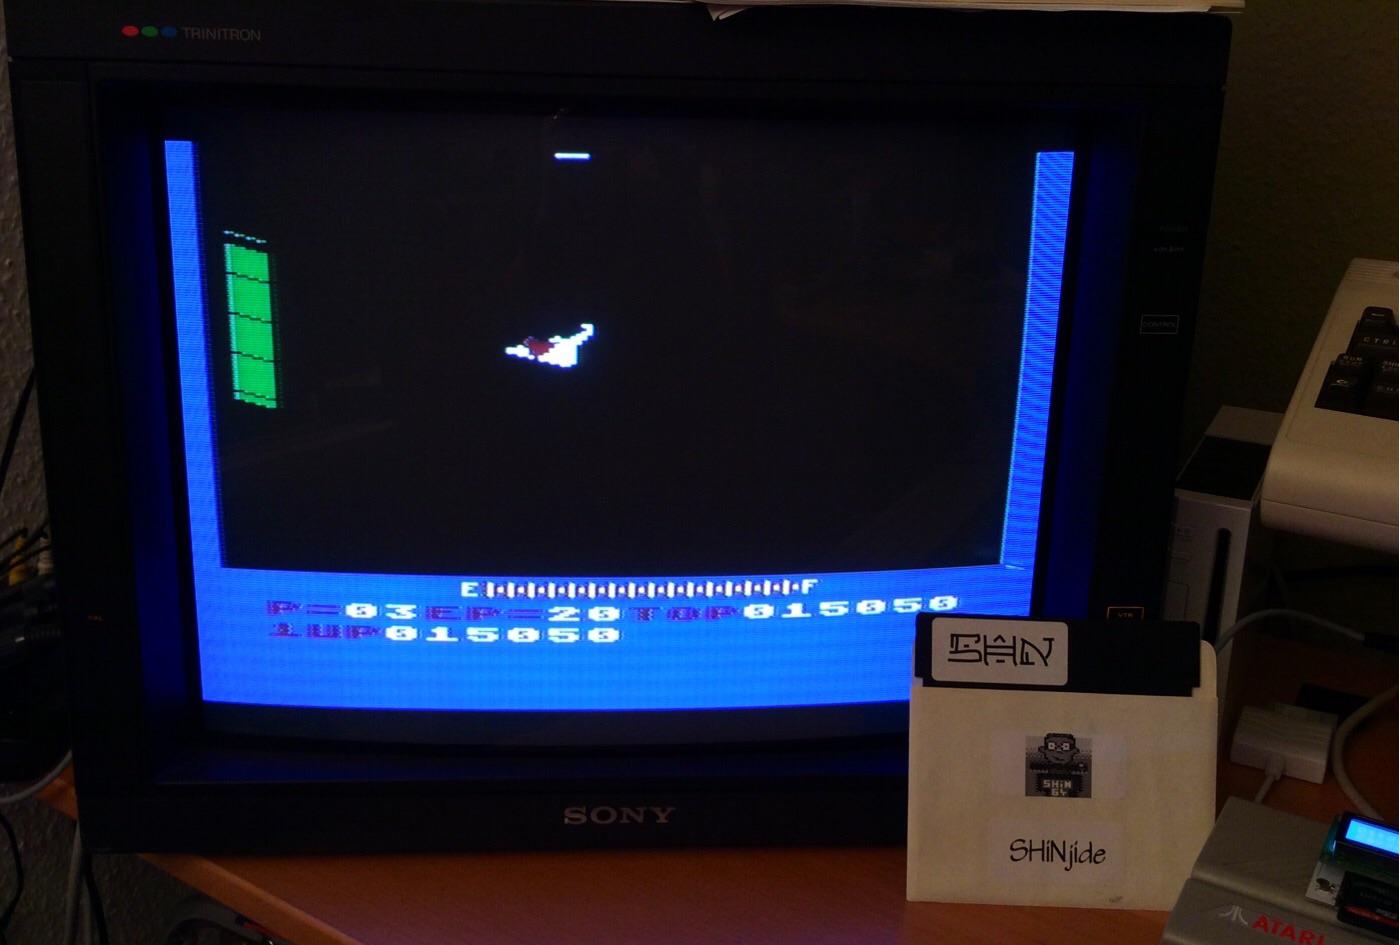 SHiNjide: Zaxxon (Atari 400/800/XL/XE) 15,050 points on 2015-01-10 10:17:56